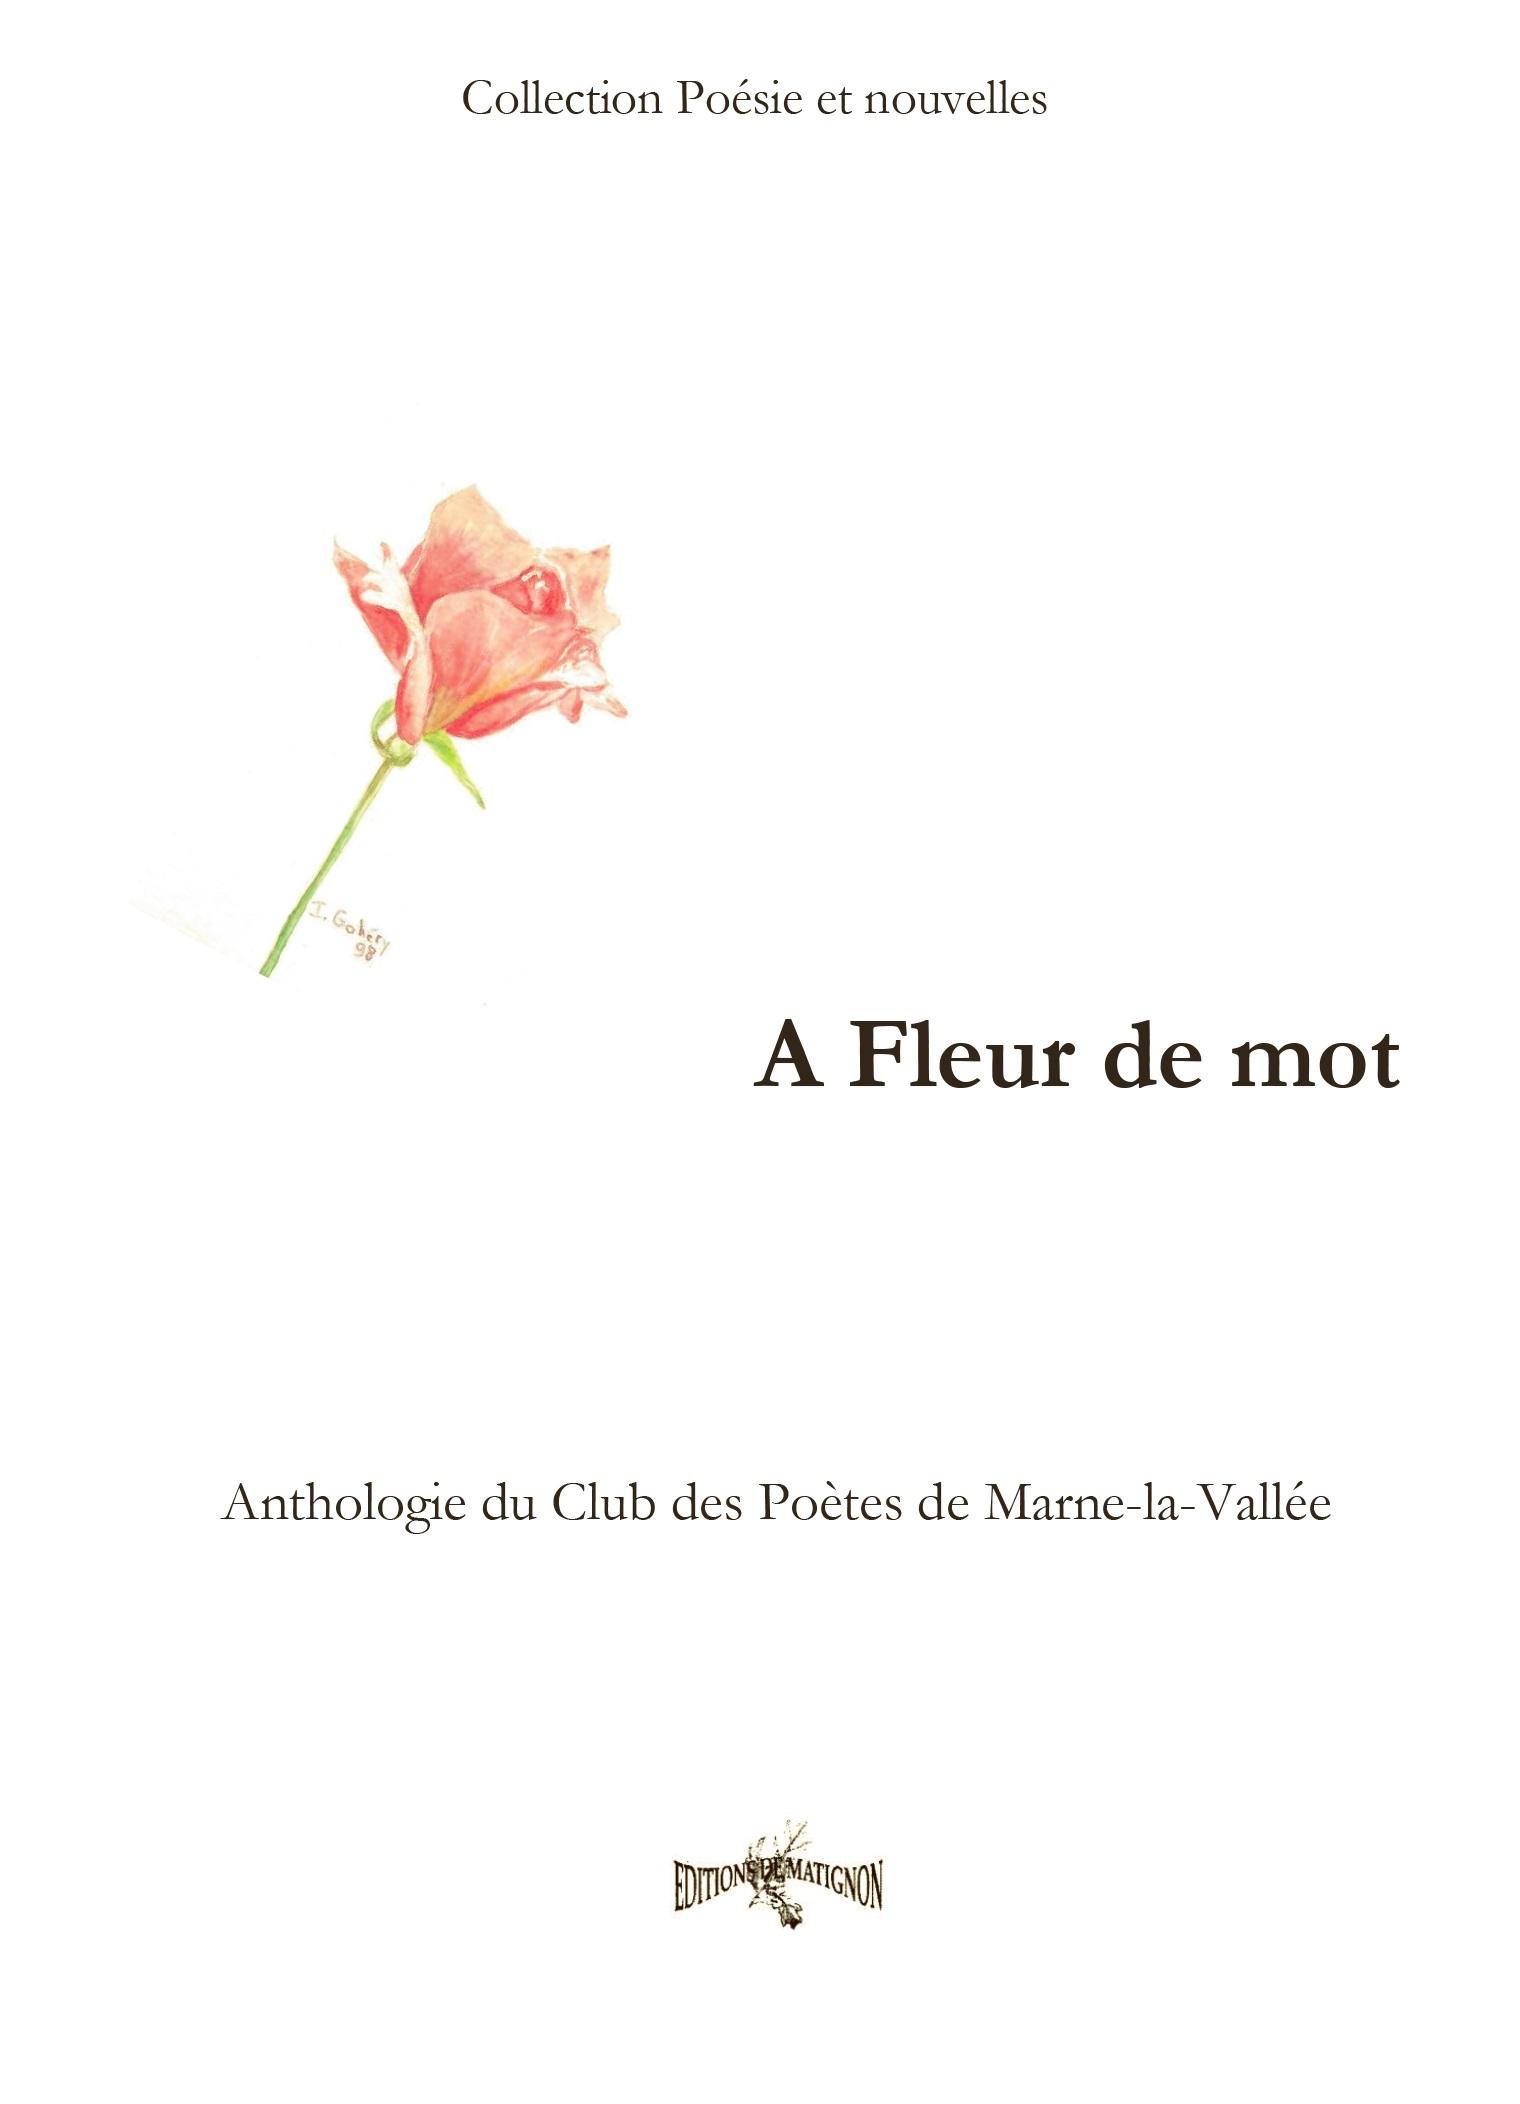 A fleur de mot